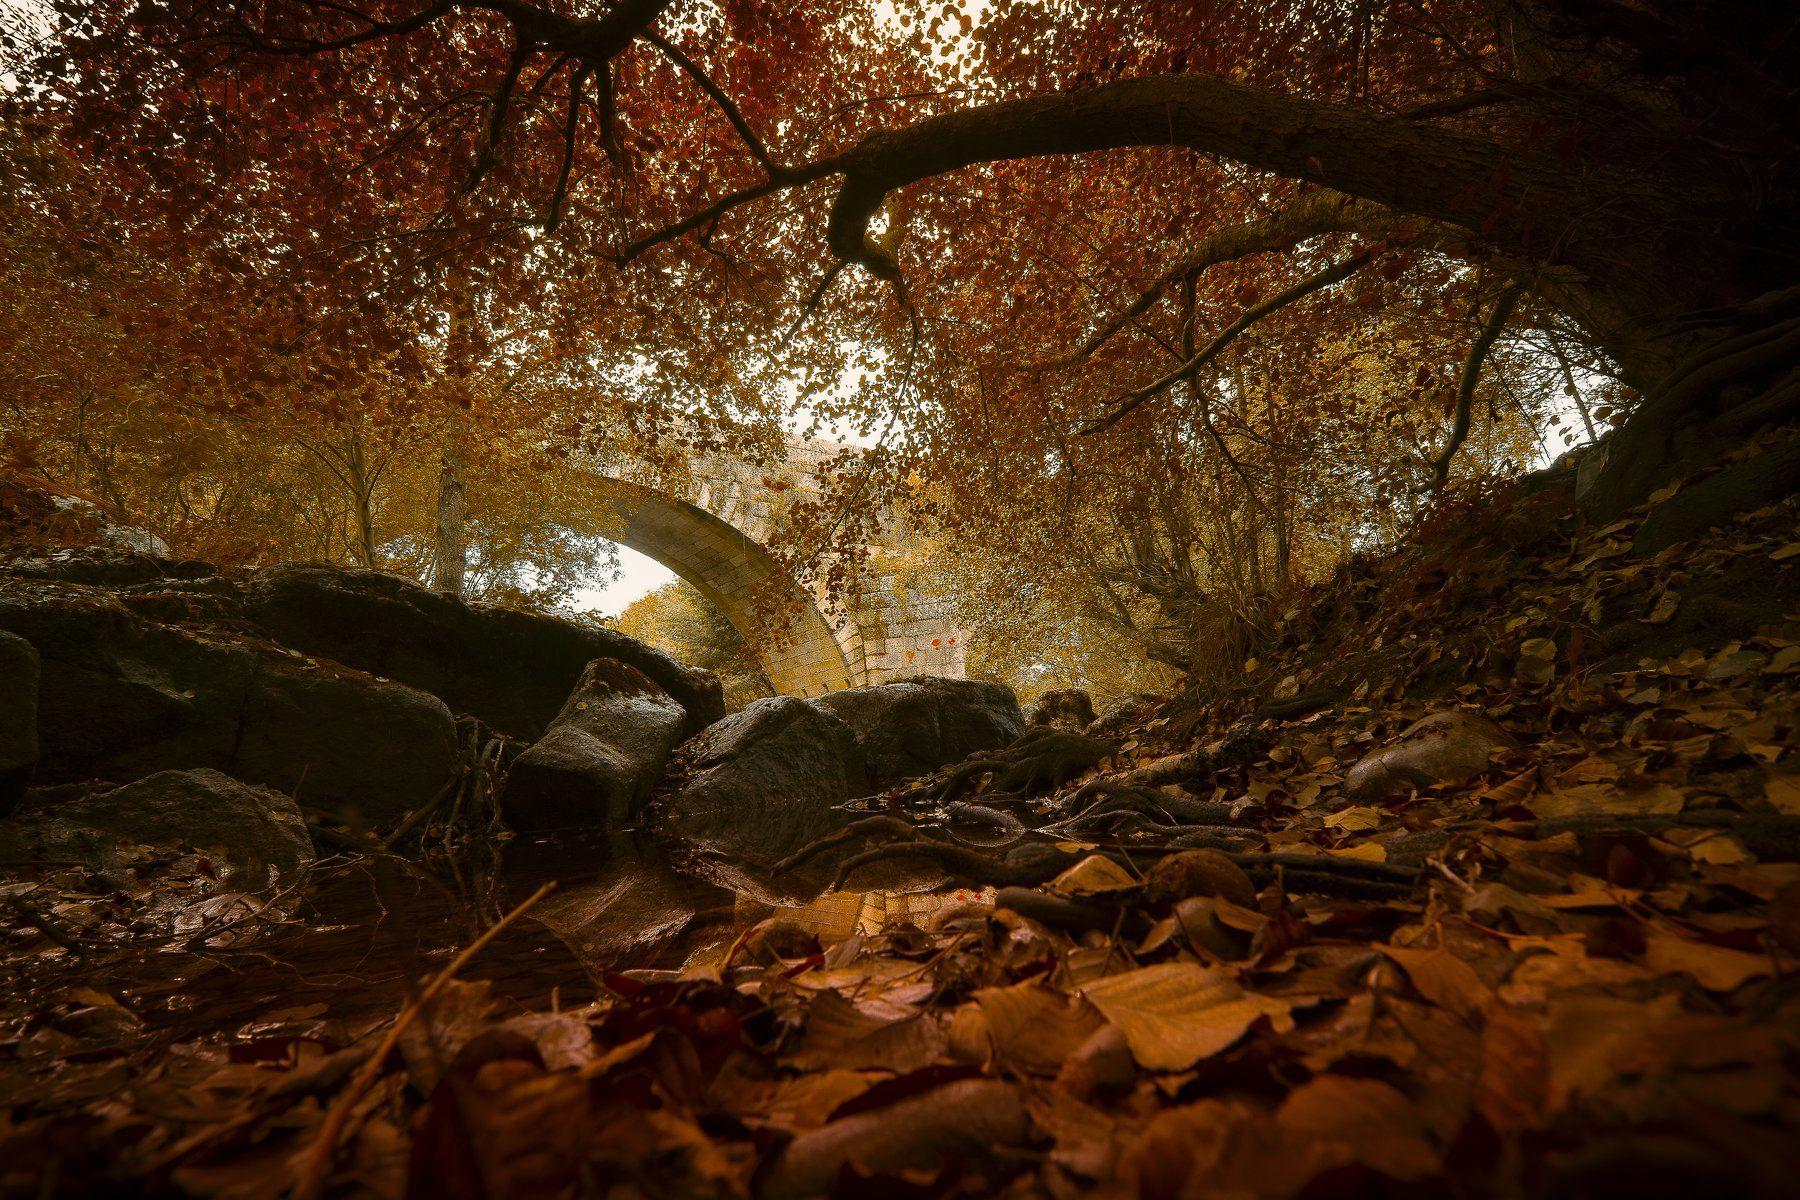 autumn, fall, brown, orange, leaves, reflections, colors, Antonio Bernardino